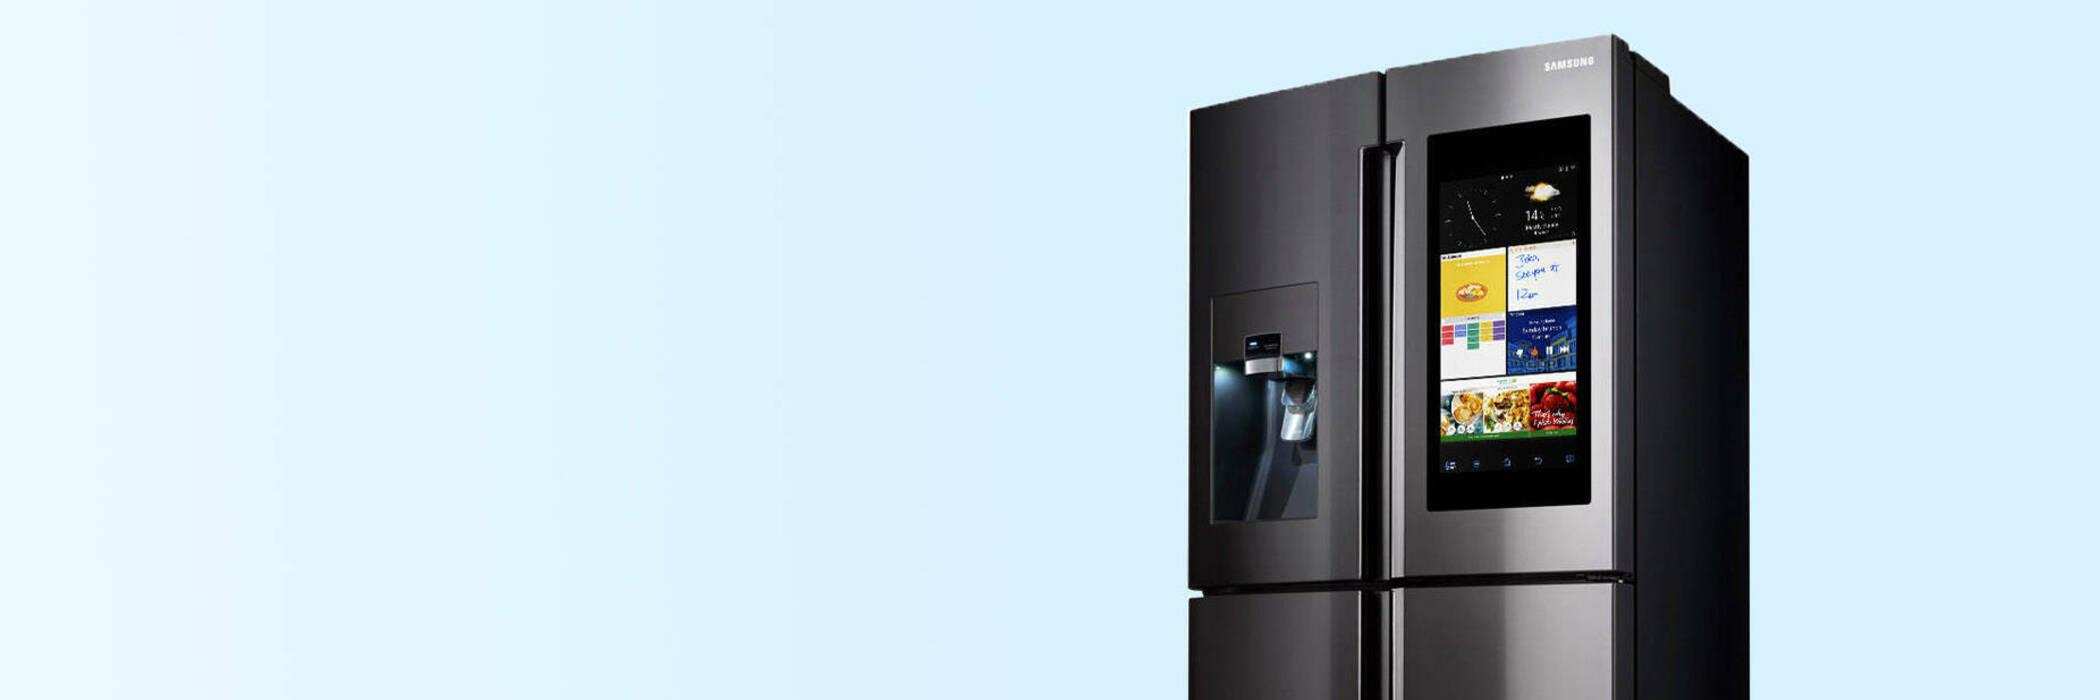 Samsung Family Hub smart fridge-freezer